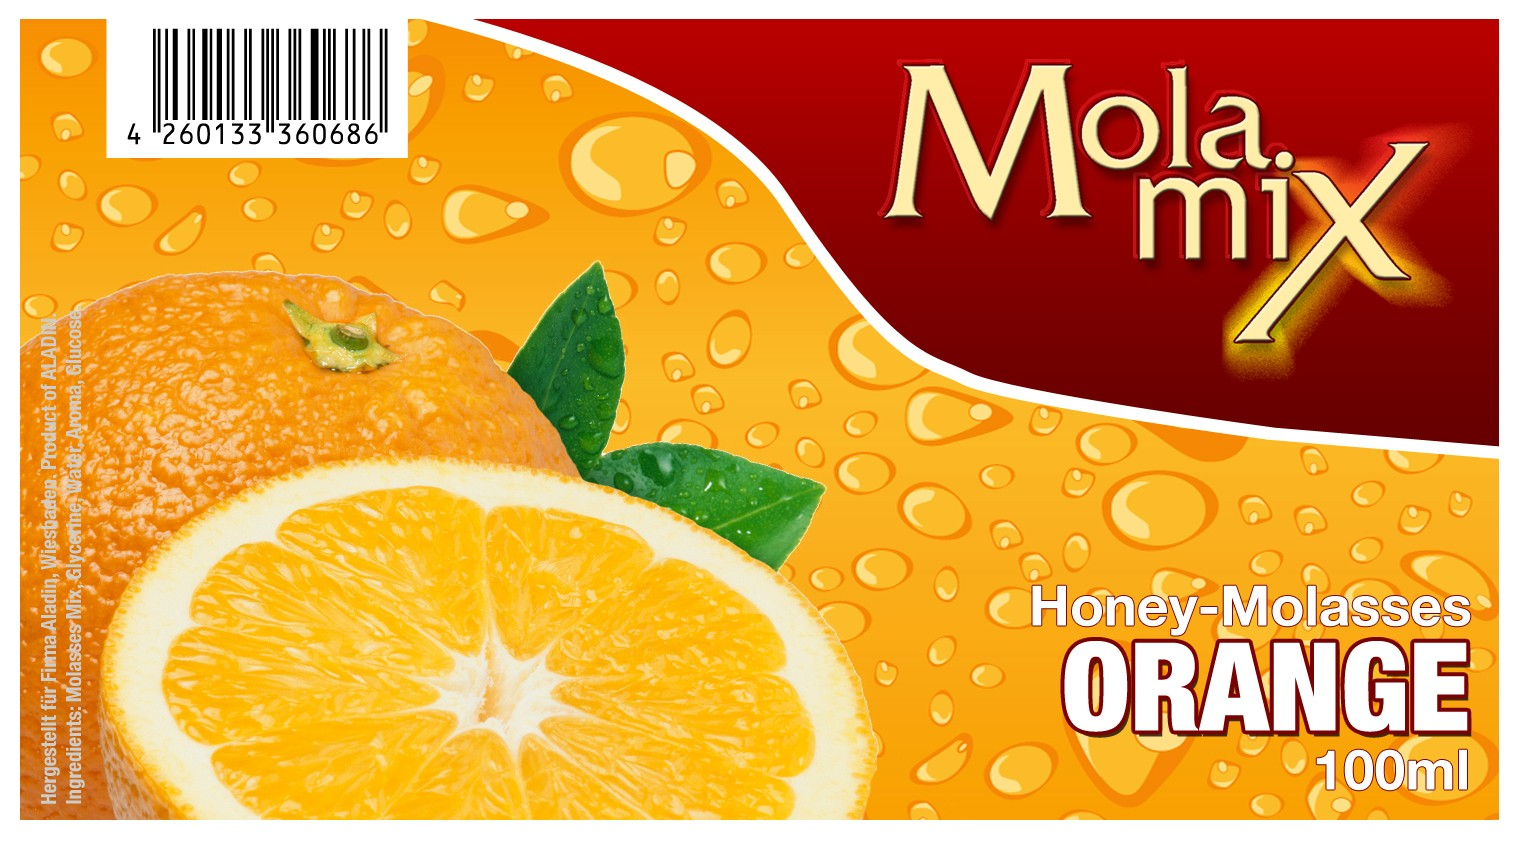 Mola Mix Orange